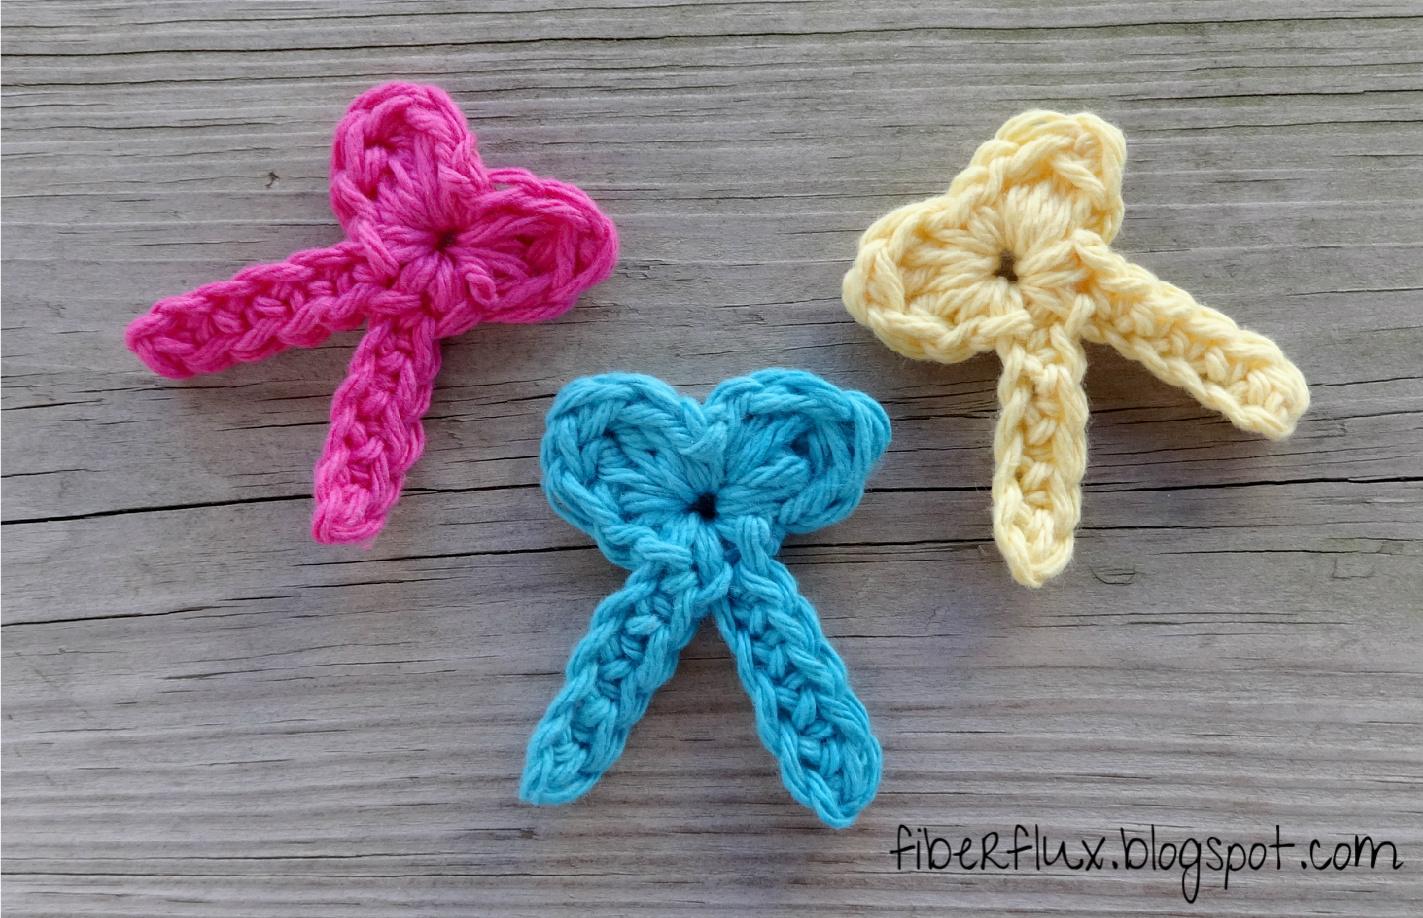 Crochet Bow : Fiber Flux: Free Crochet Pattern...One Round Bows!